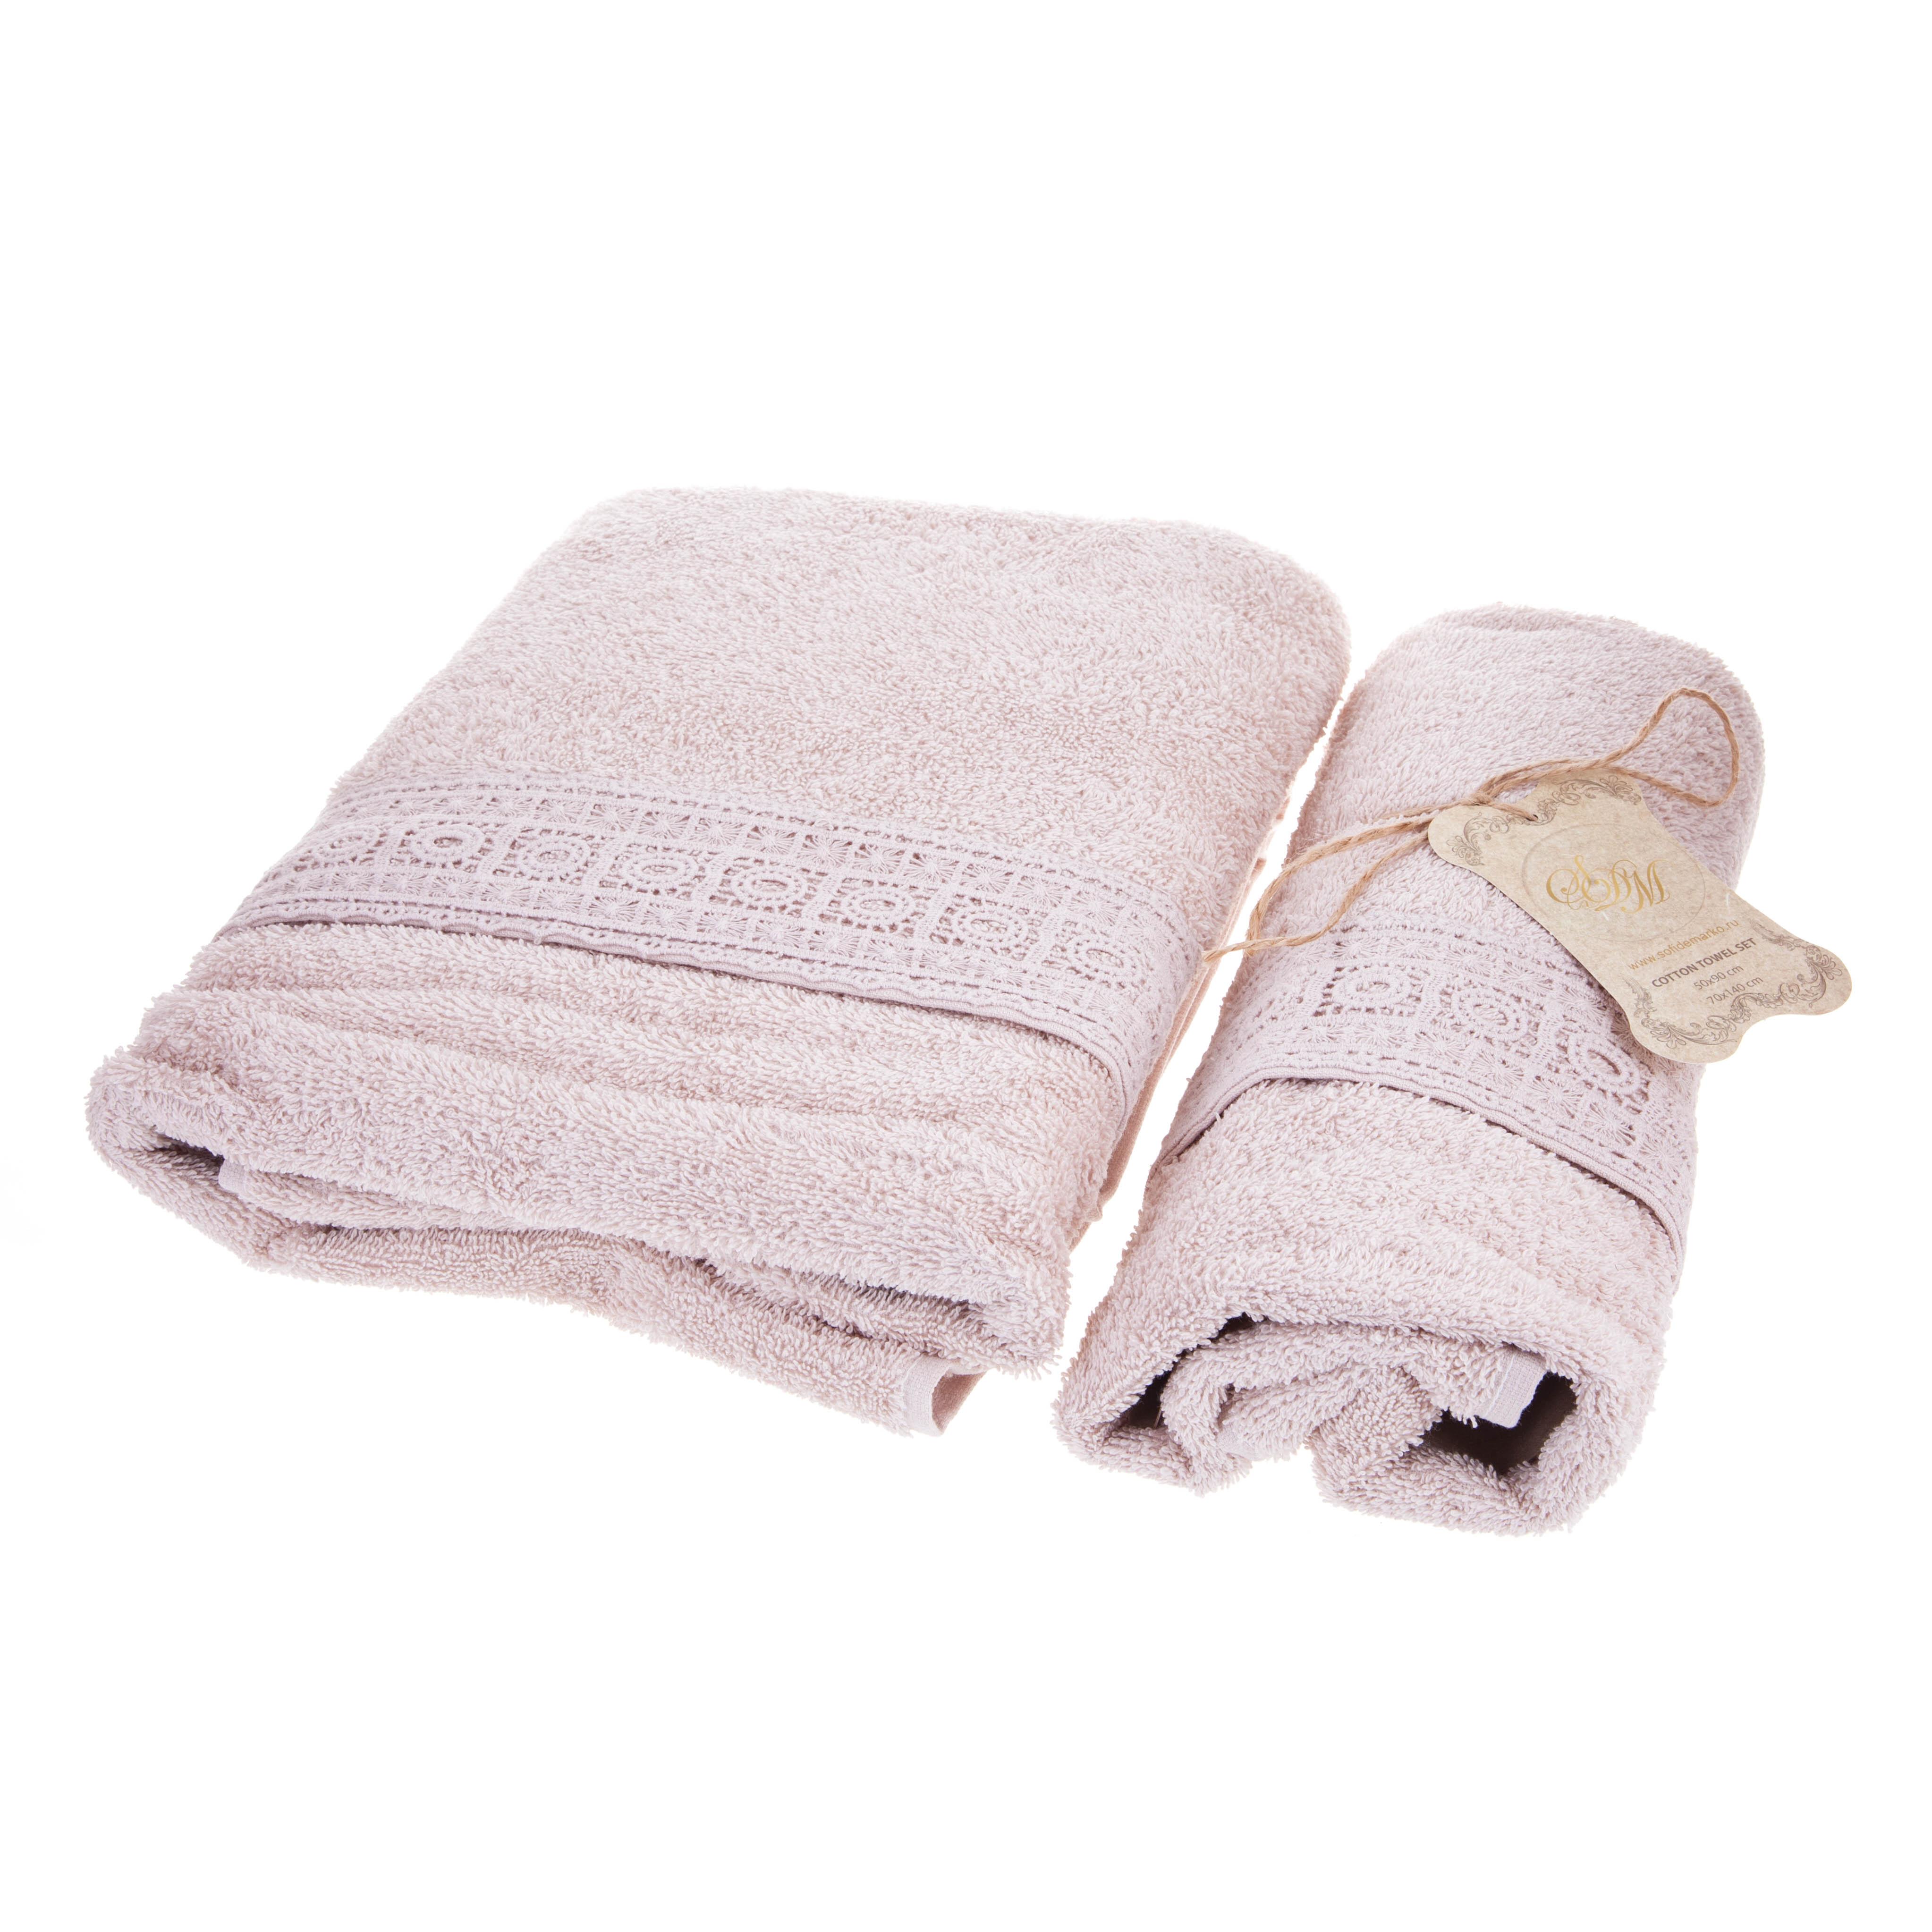 полотенца Полотенца с вышивкой katia Sofi de marko S.070